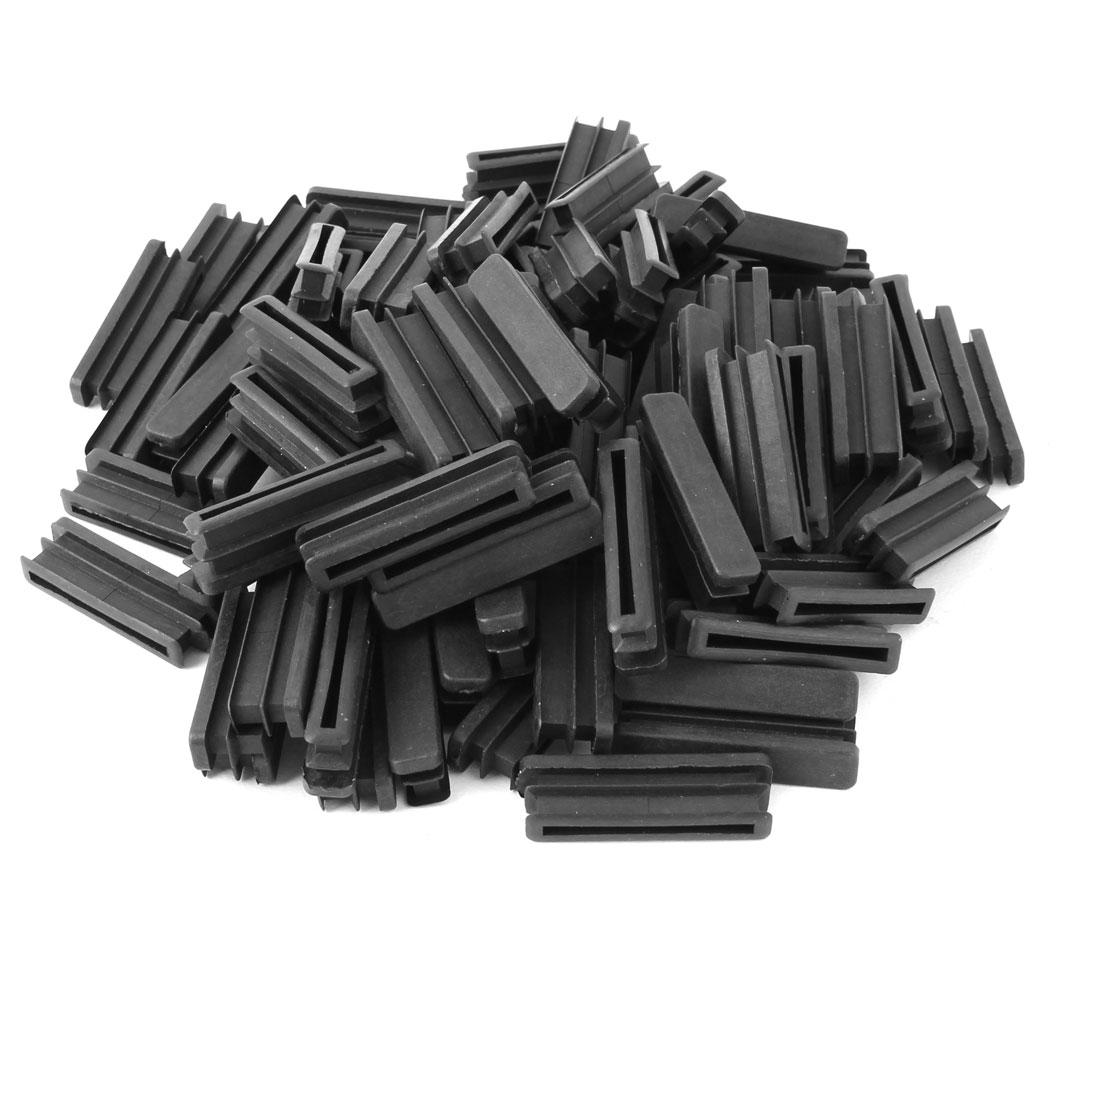 Home Plastic Rectangle Floor Protecting Furniture Table Leg Tube Inserts Black 50 x 10mm 100pcs